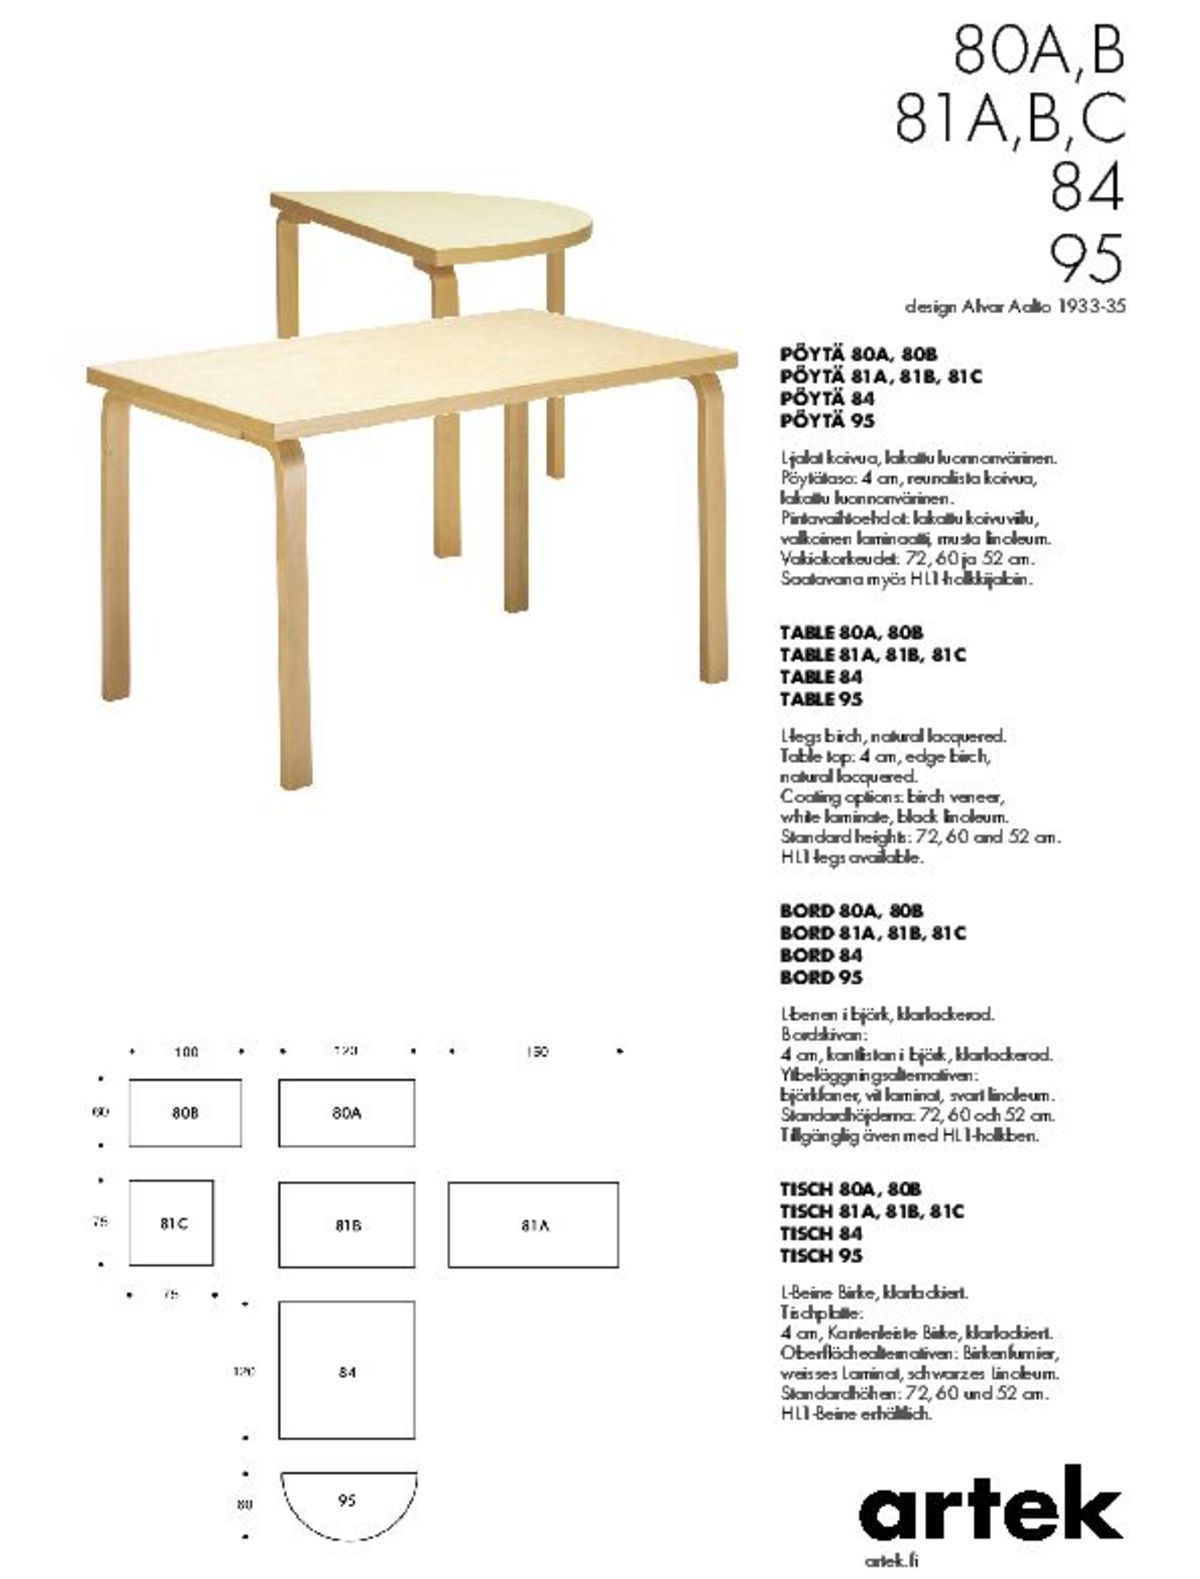 Aalto-Table-80A-80B-81A-81B-81C-84-95-Factsheet-98968525